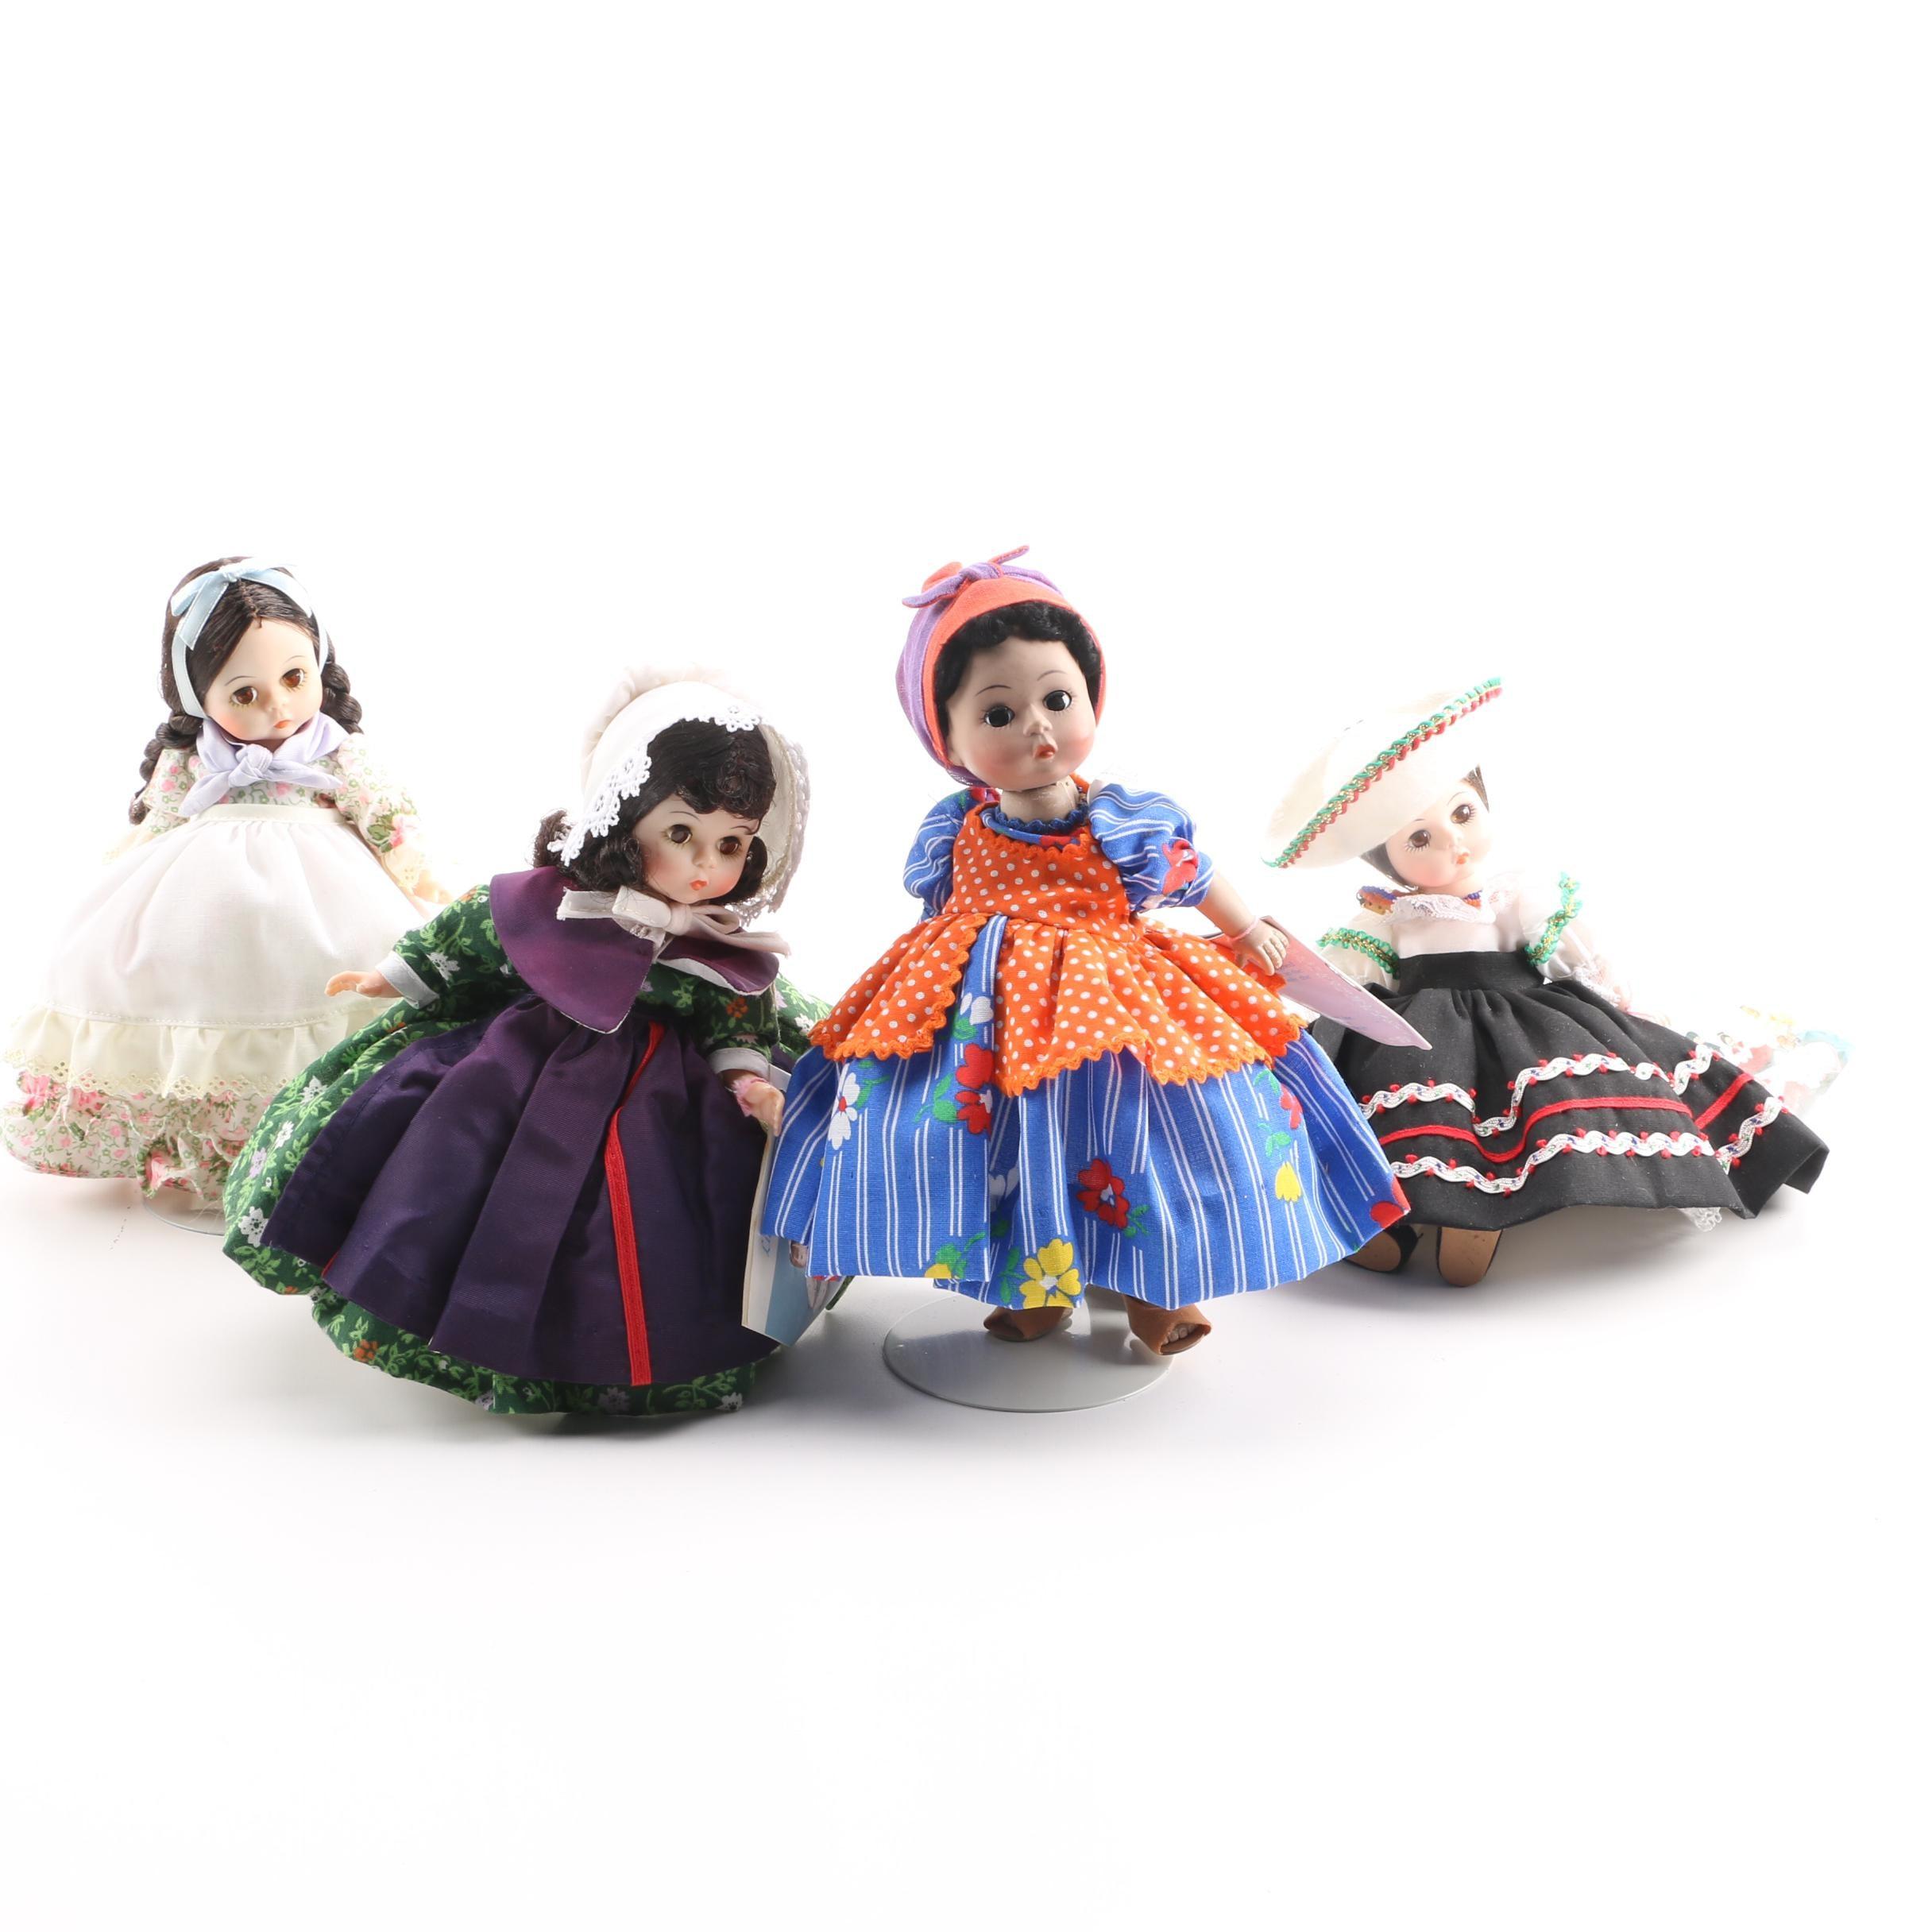 Vintage Madame Alexander International Dolls